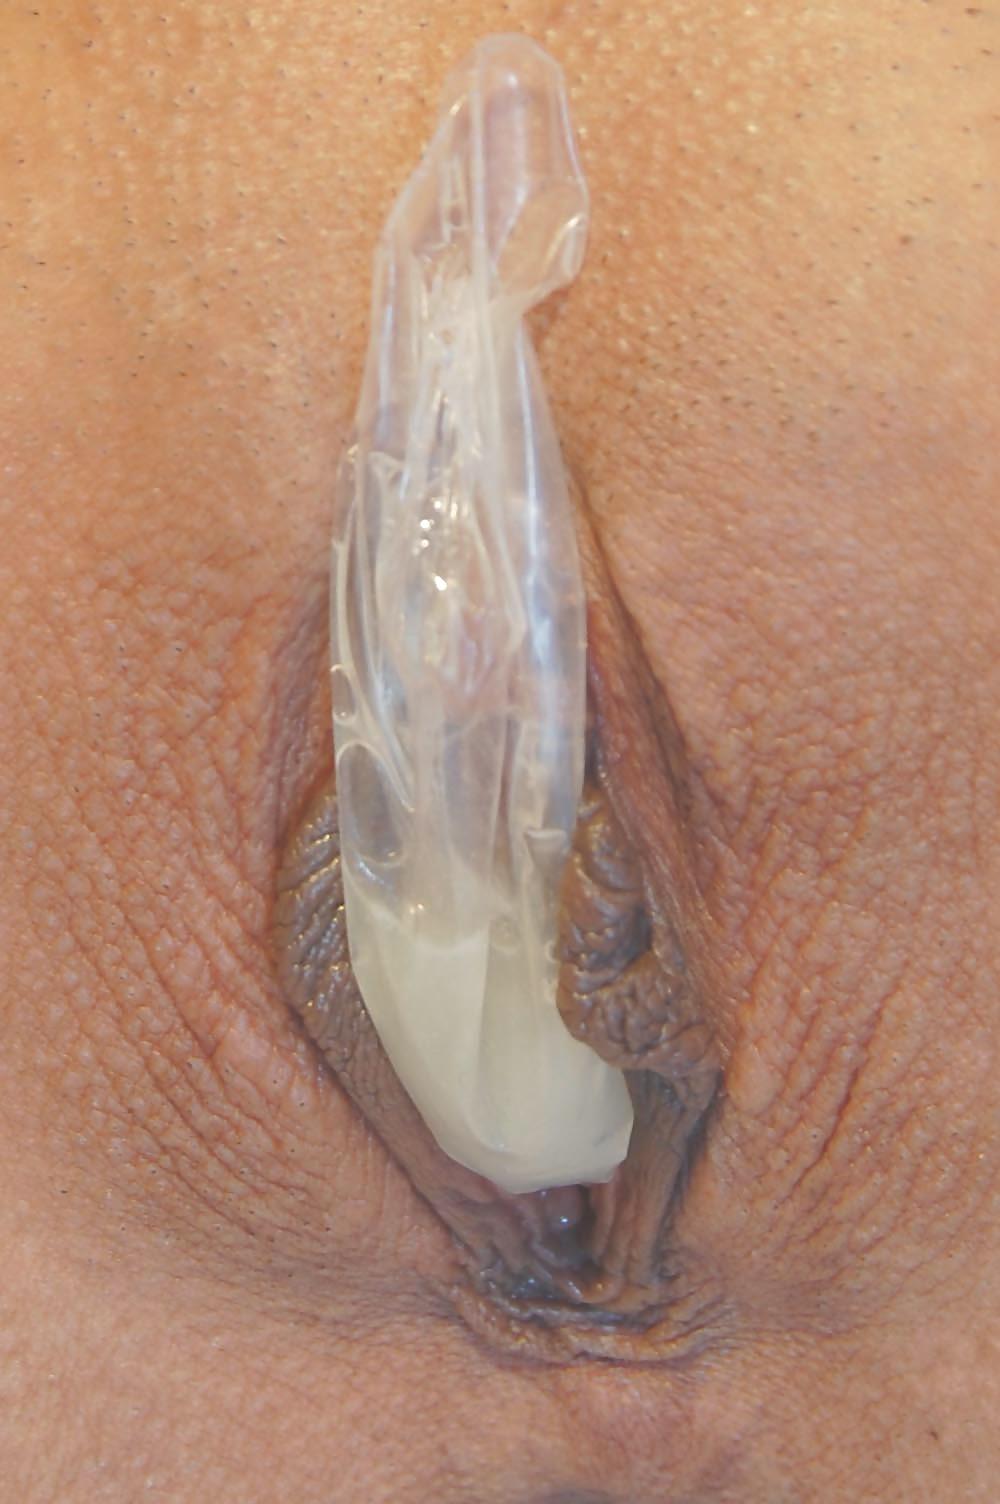 condoms-for-vaginal-burning